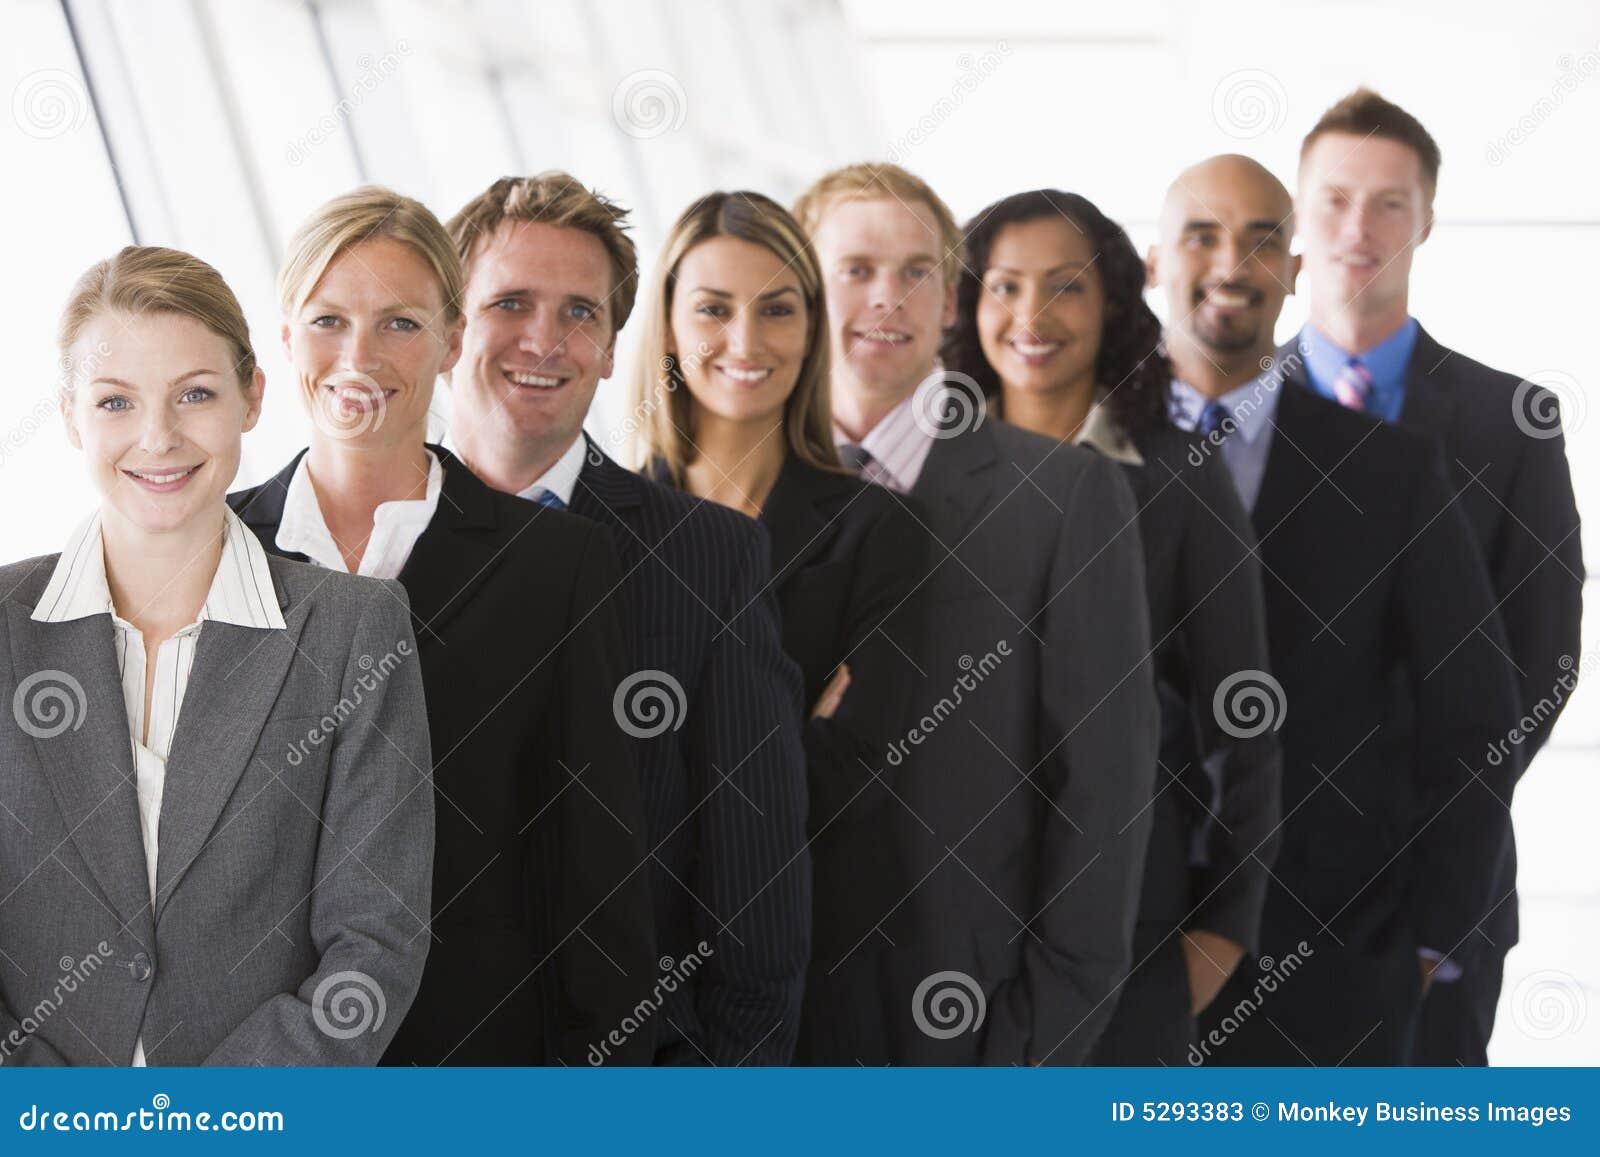 Office staff